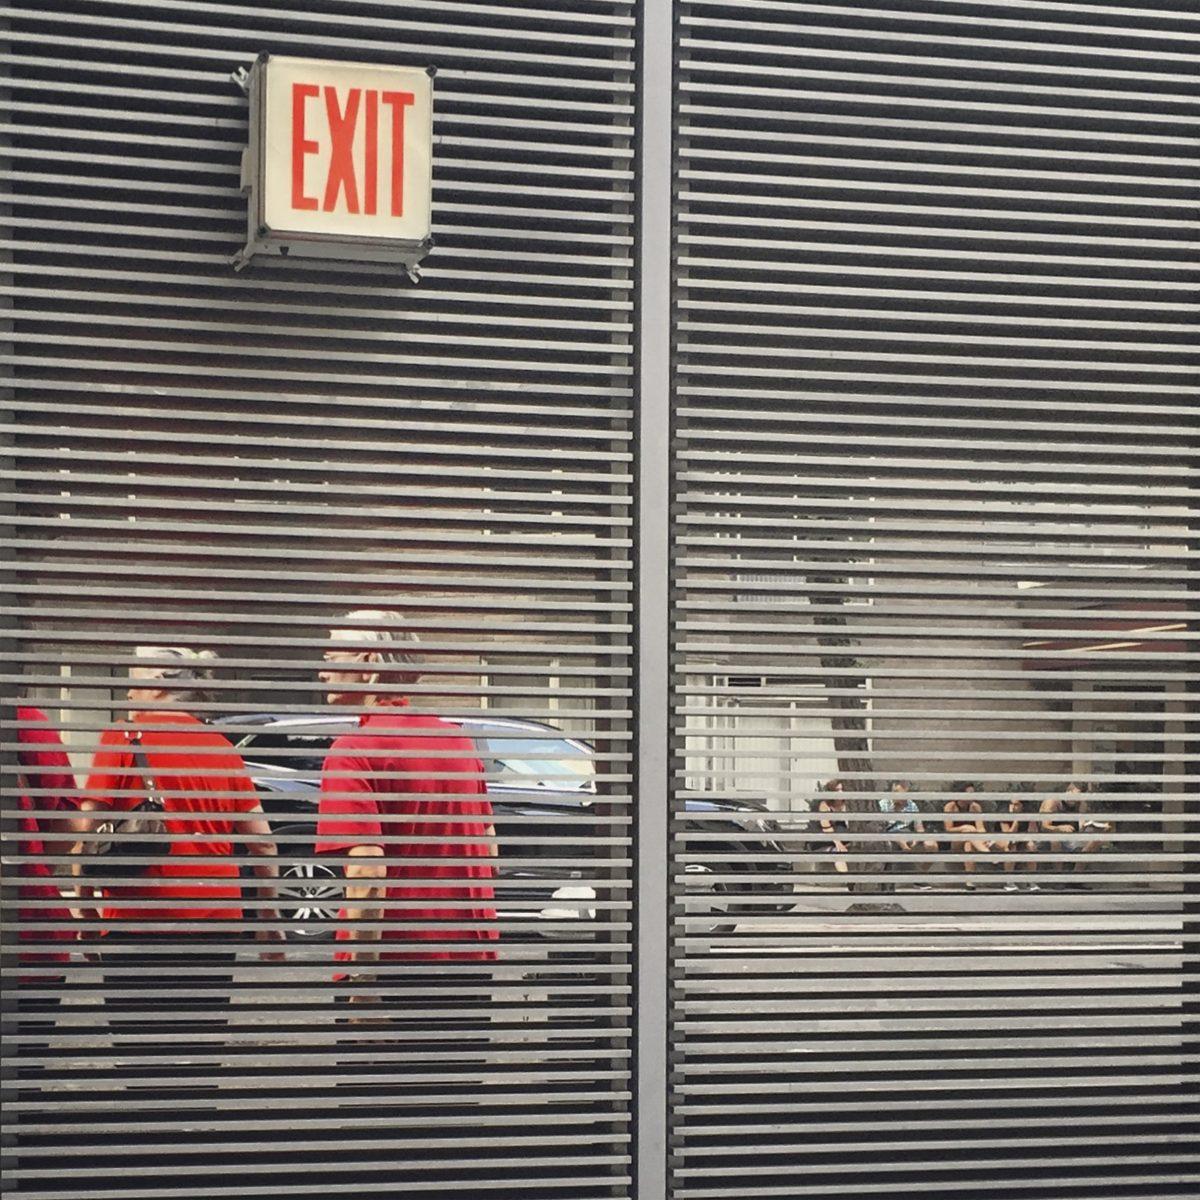 Les mamies du MoMA © Vincent Migrenne